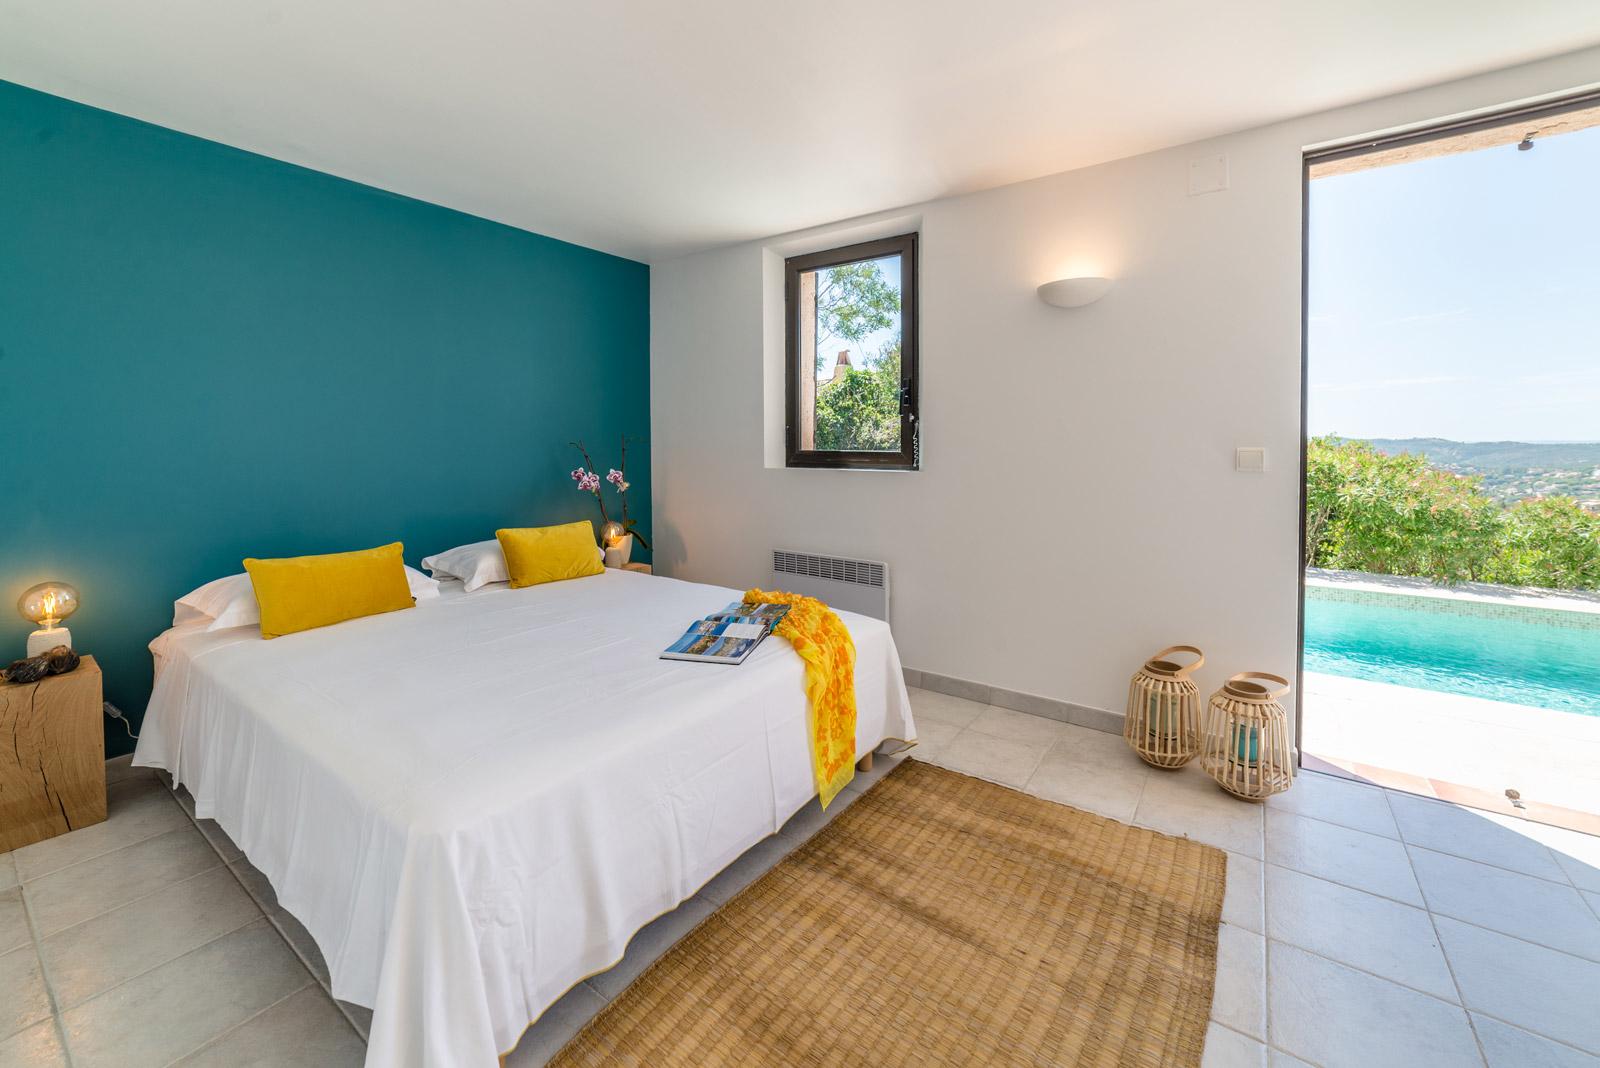 Photo professionnelle immobilier - Villa